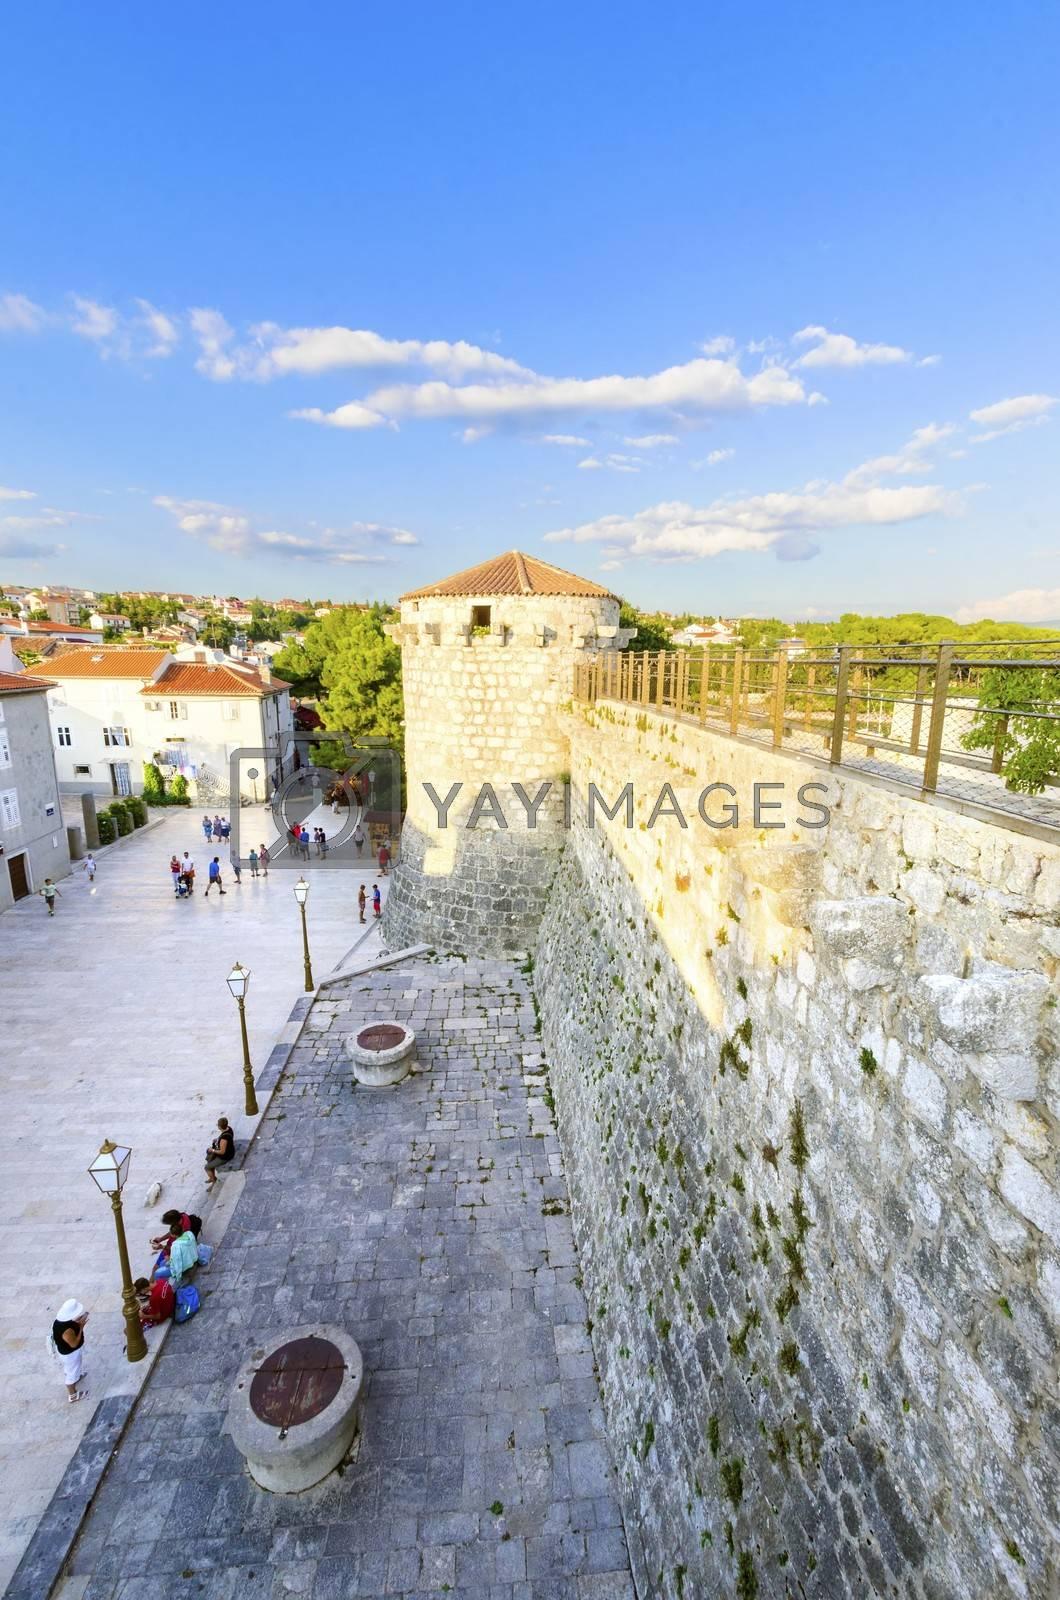 The round venetian tower of Frankopan Castle and the Kamplin square in Krk, Croatia - Frankopanski Kastel, part of the medieval city walls and now promenade.